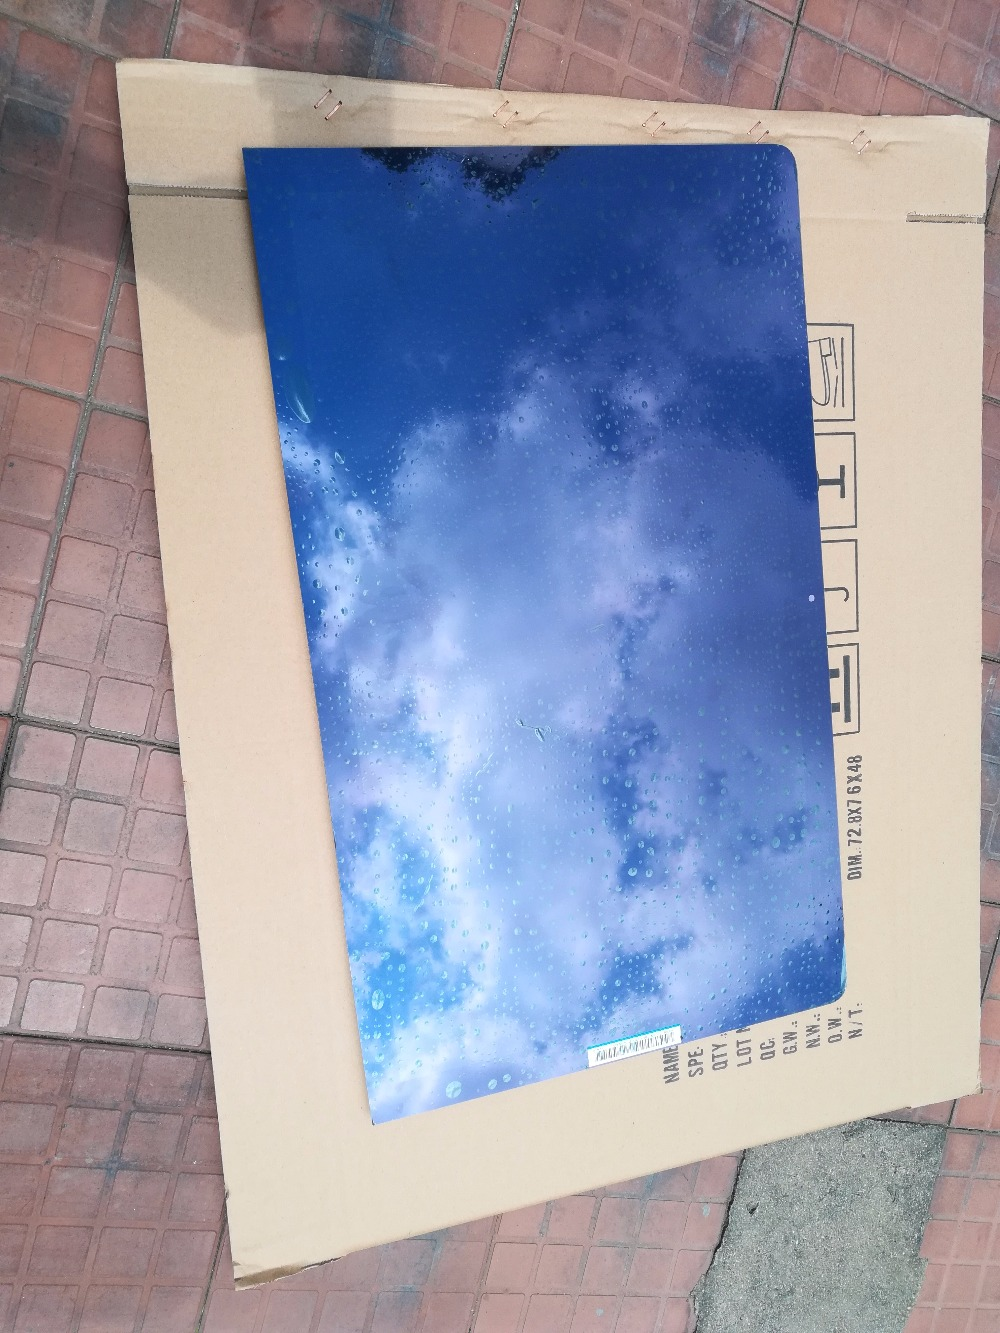 Nuevo iMac Retina 27 5 K 2015 IPS pantalla LCD LM270QQ1 SD B1 SDB1 A1419 5120x2880 EMC2806 661-03255